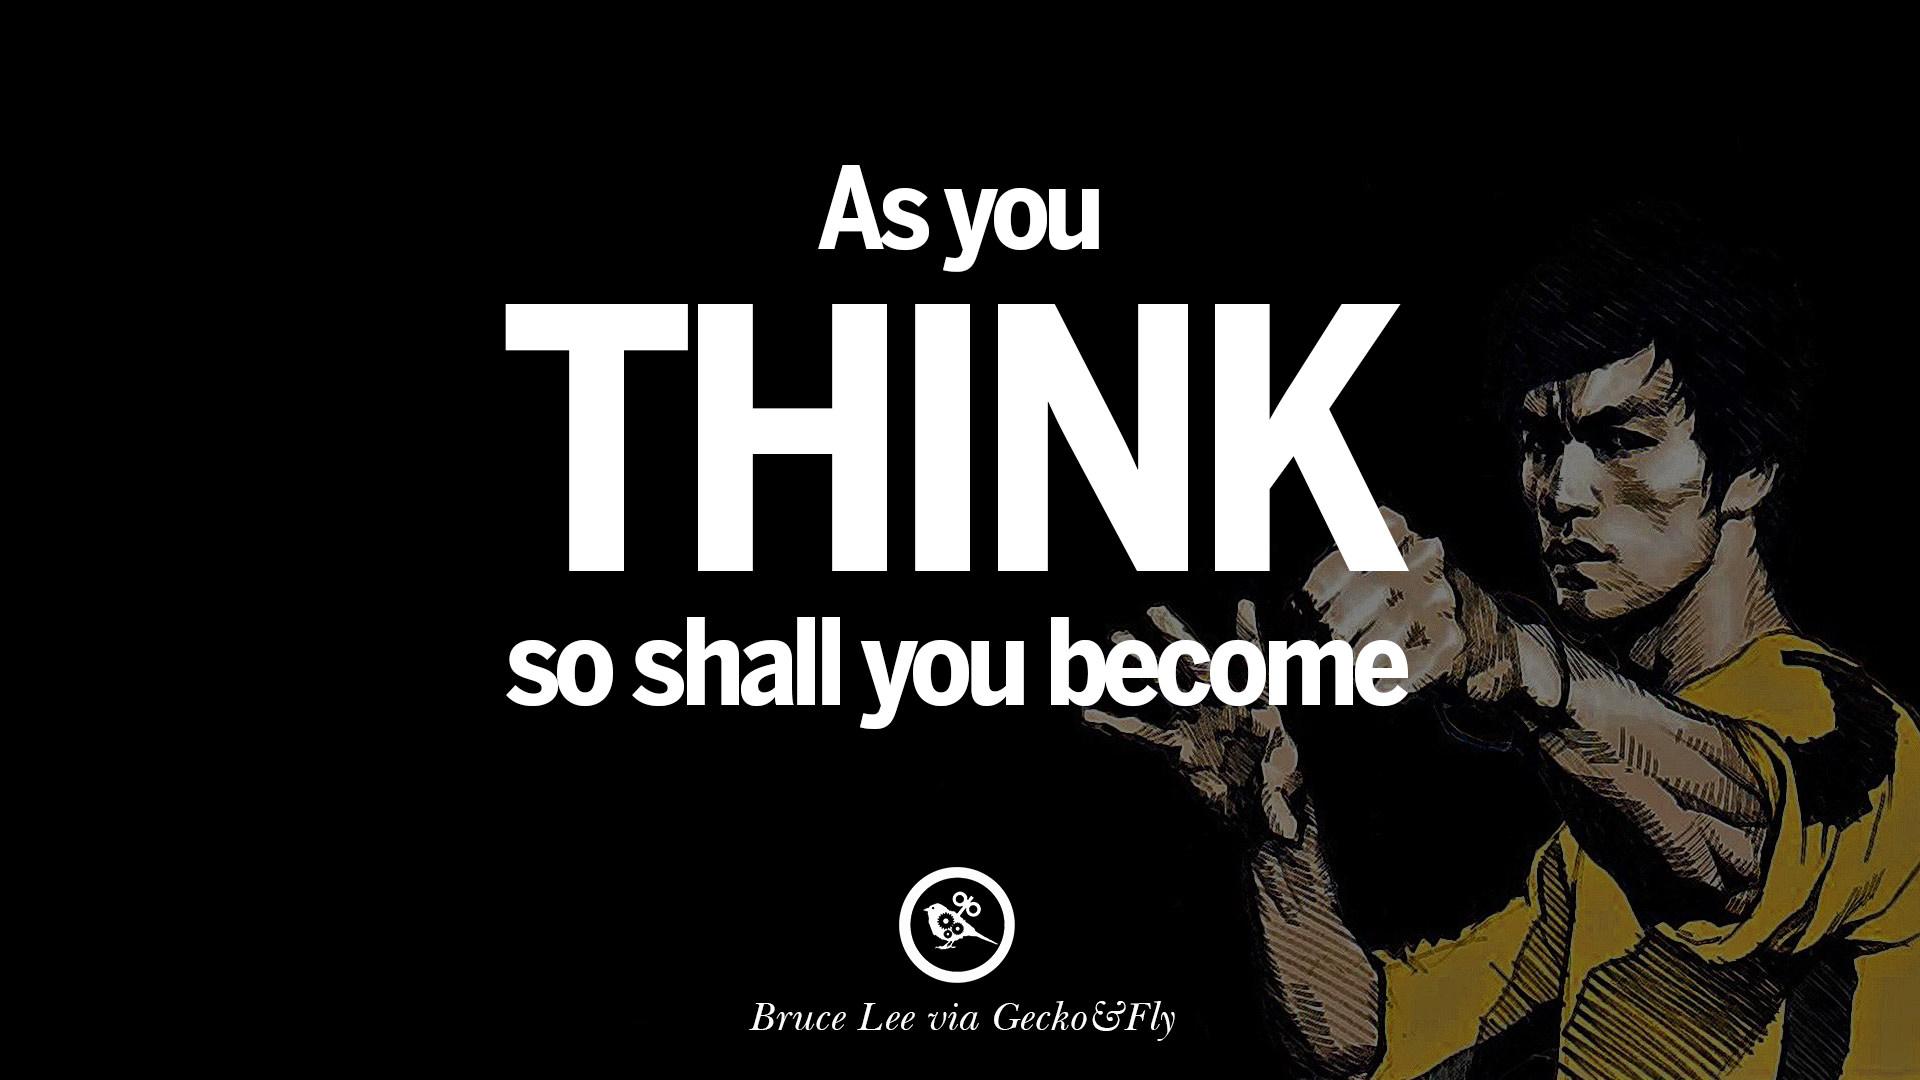 Zendha Bruce Lee Wallpaper Quotes